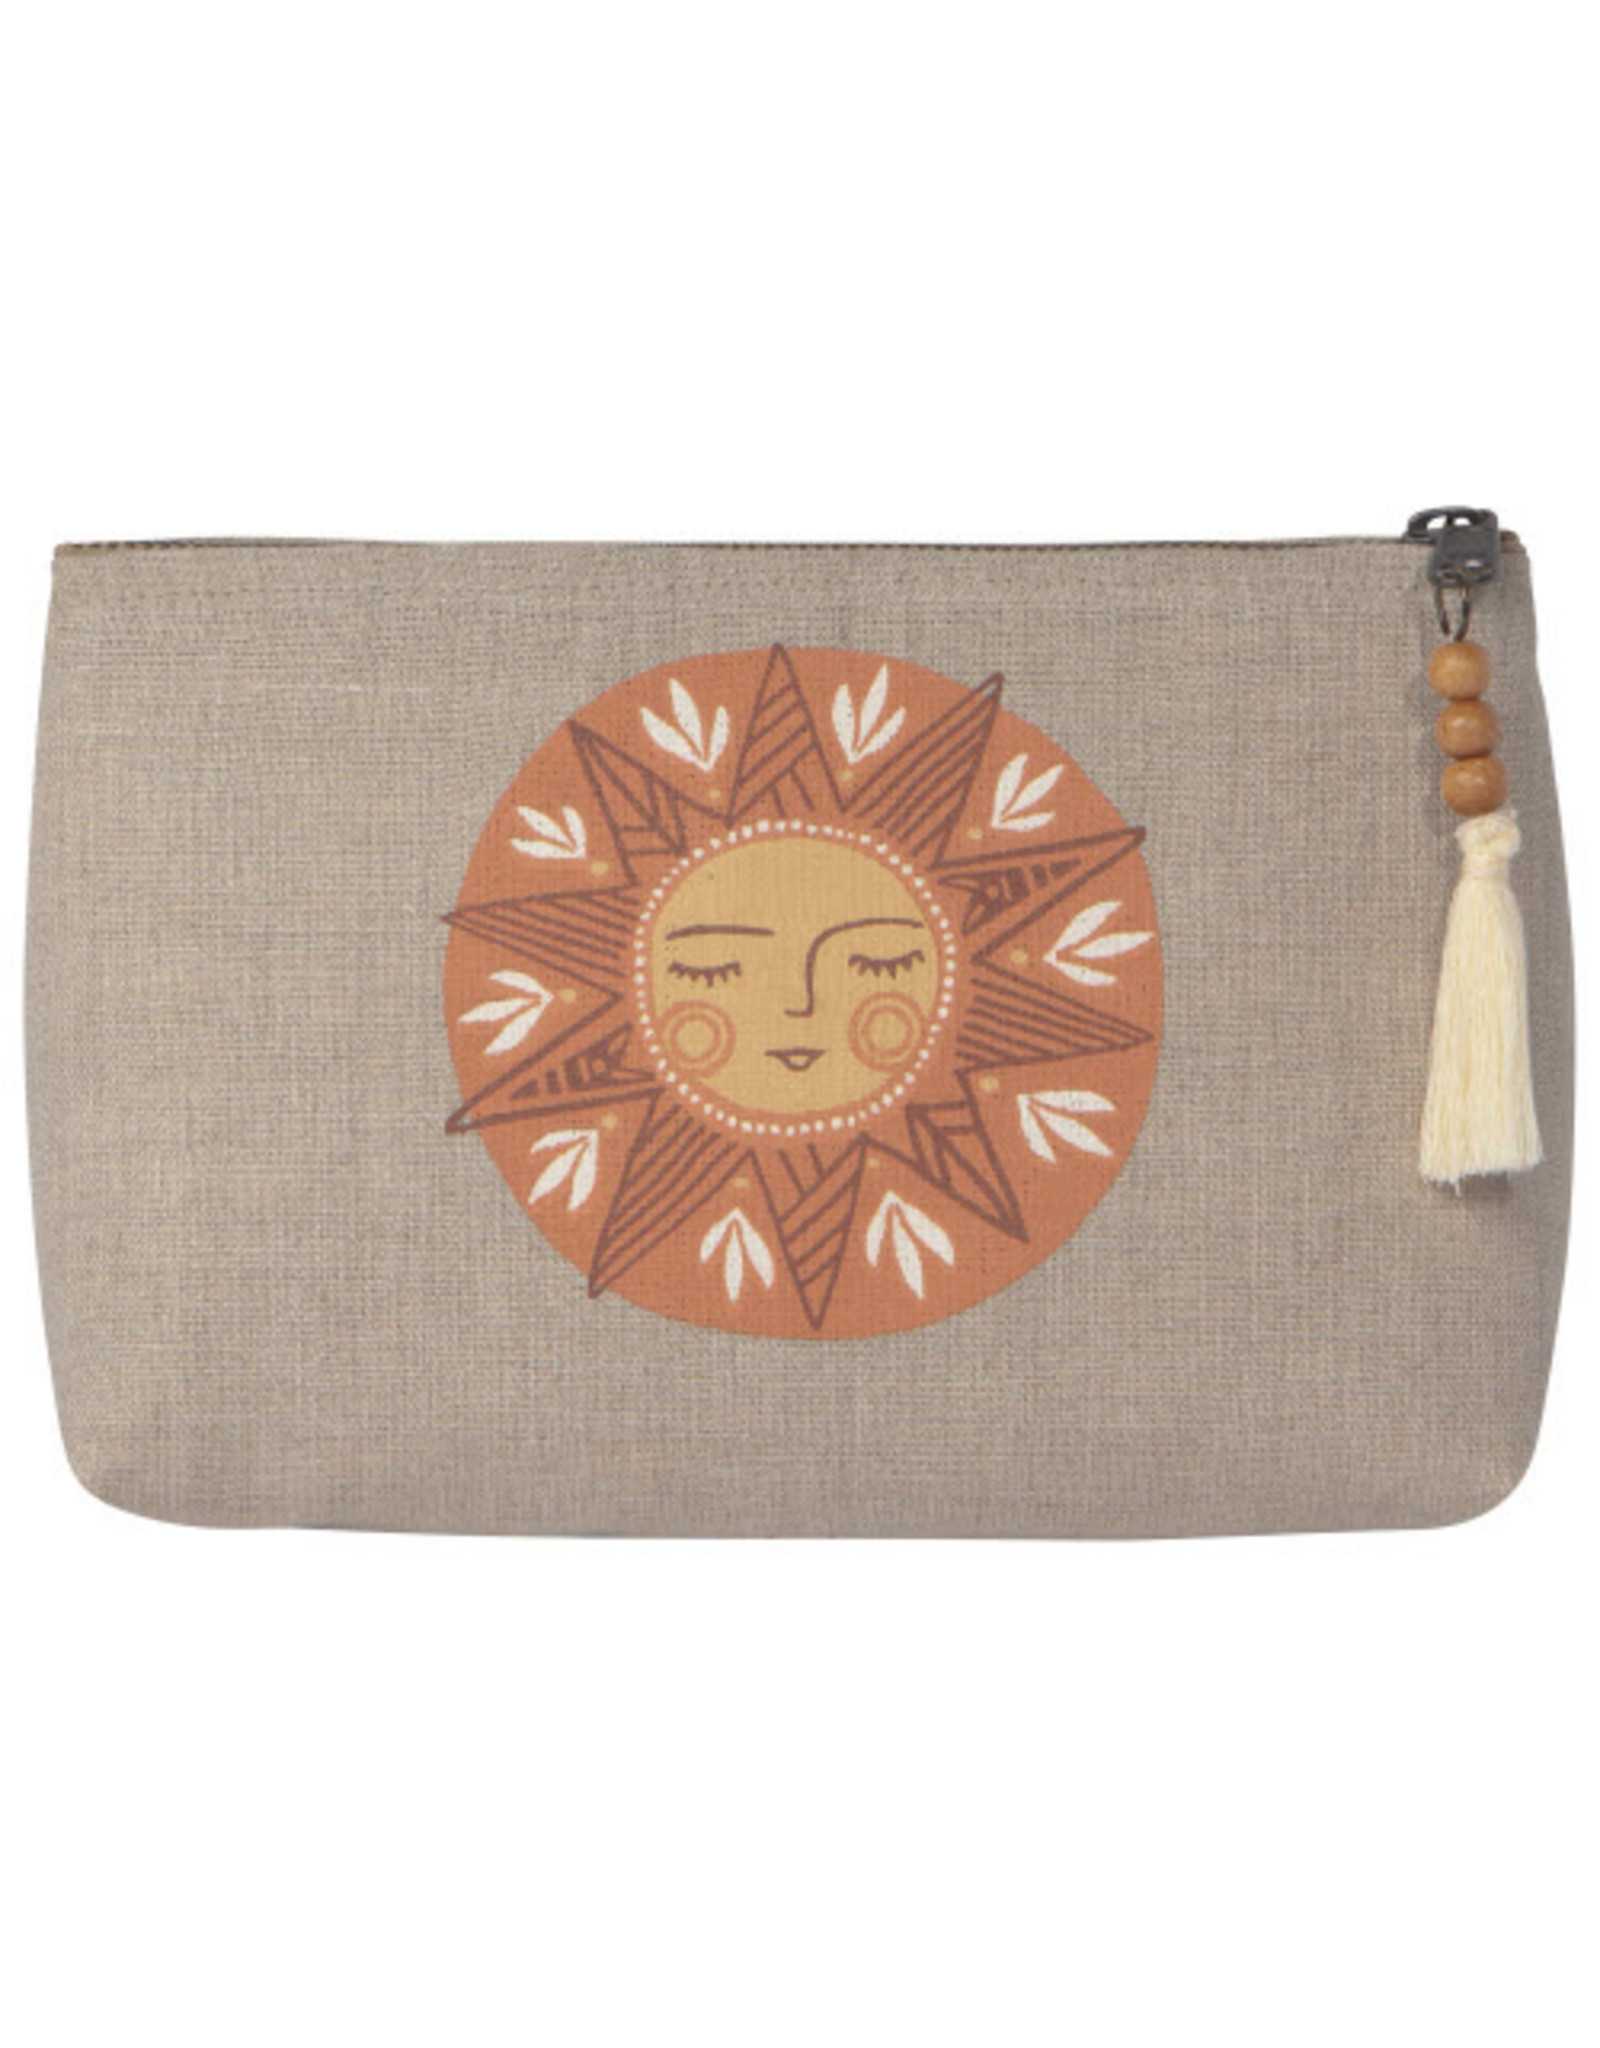 Soleil Cosmetics Bag Small